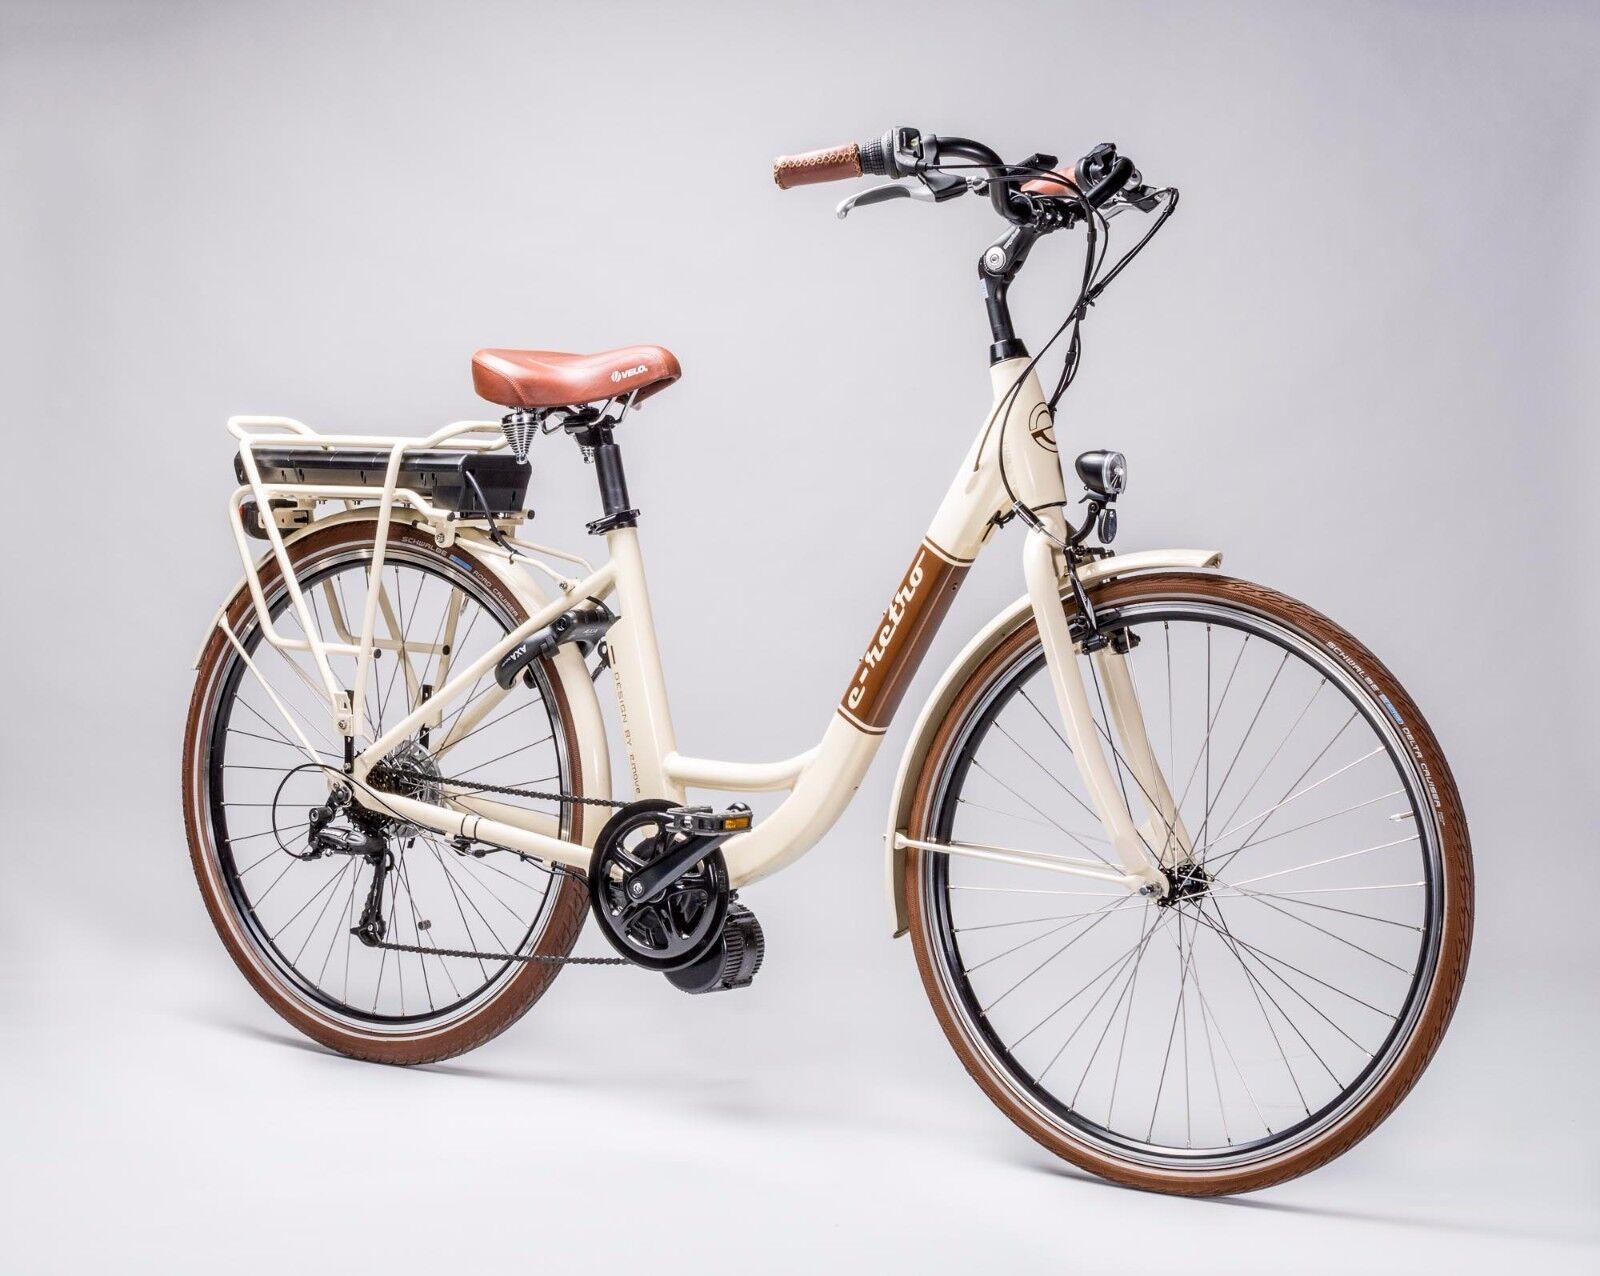 RETRO Pedelec E Bike Bike Bike Beige 28Zoll 36V10Ah Shimano BaFang Mittelmotor 8FUN BBS1 169683